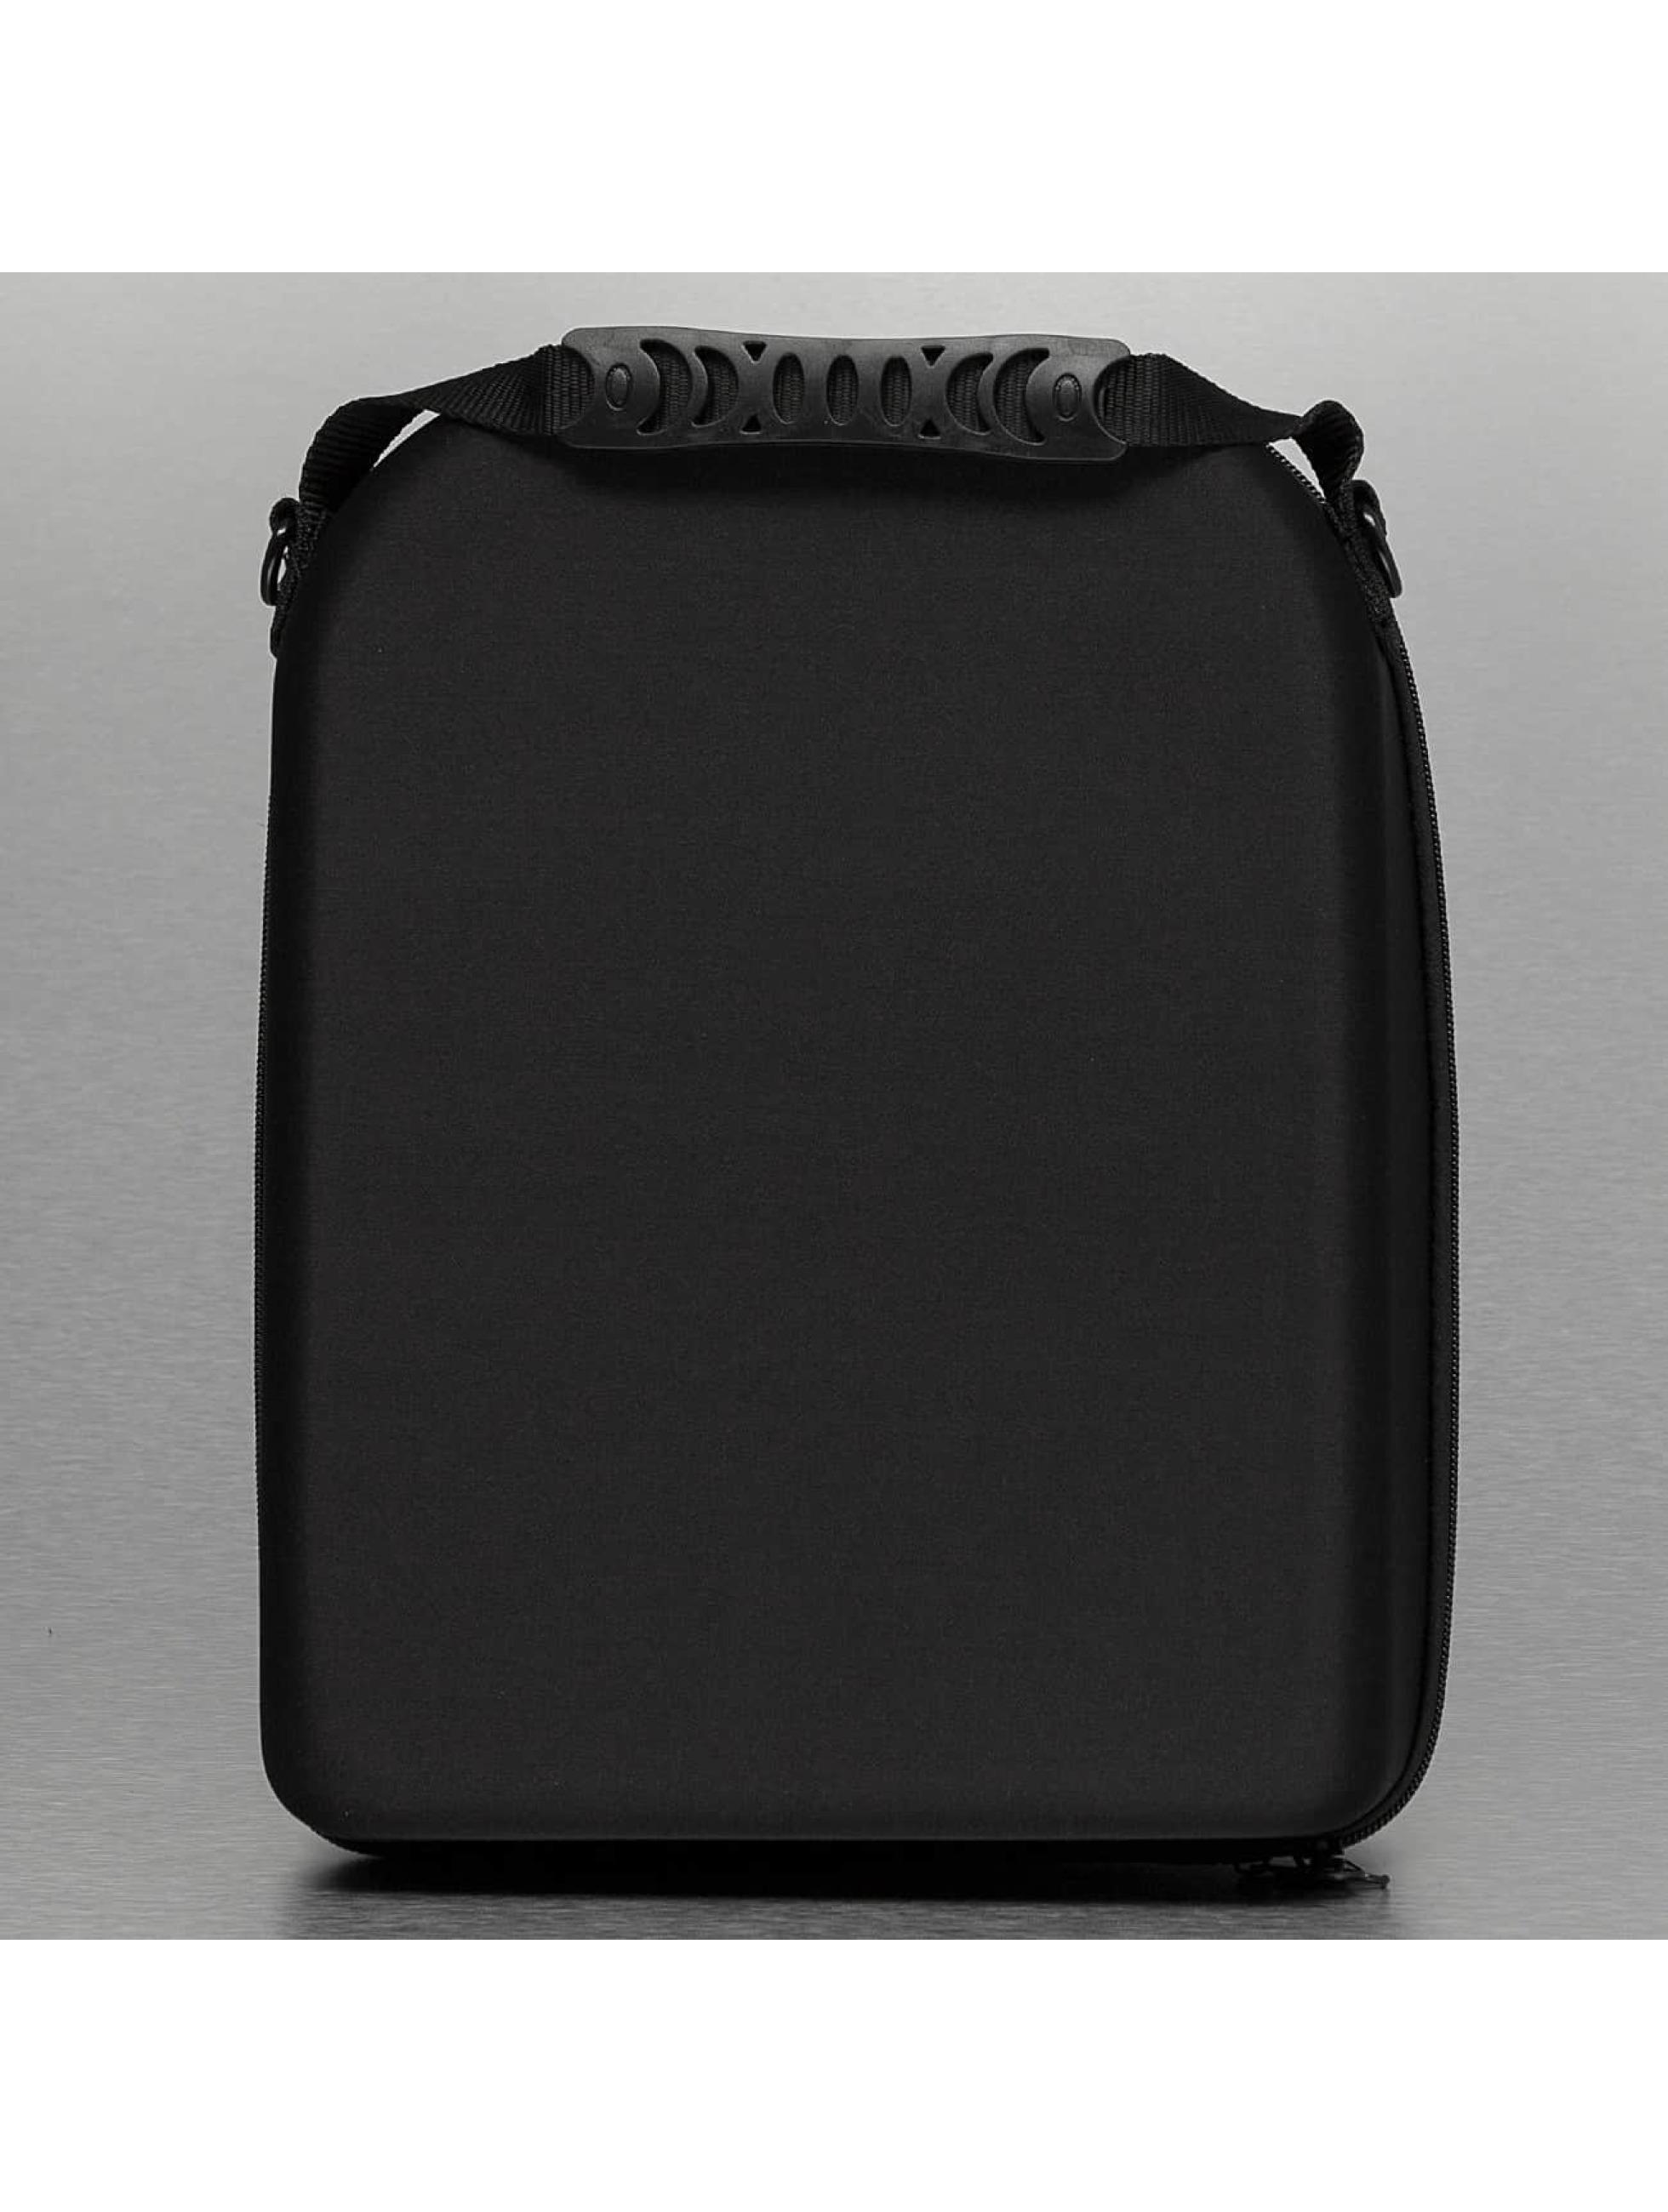 Cap Crony Sonstige 6K Carrier Travel Box schwarz